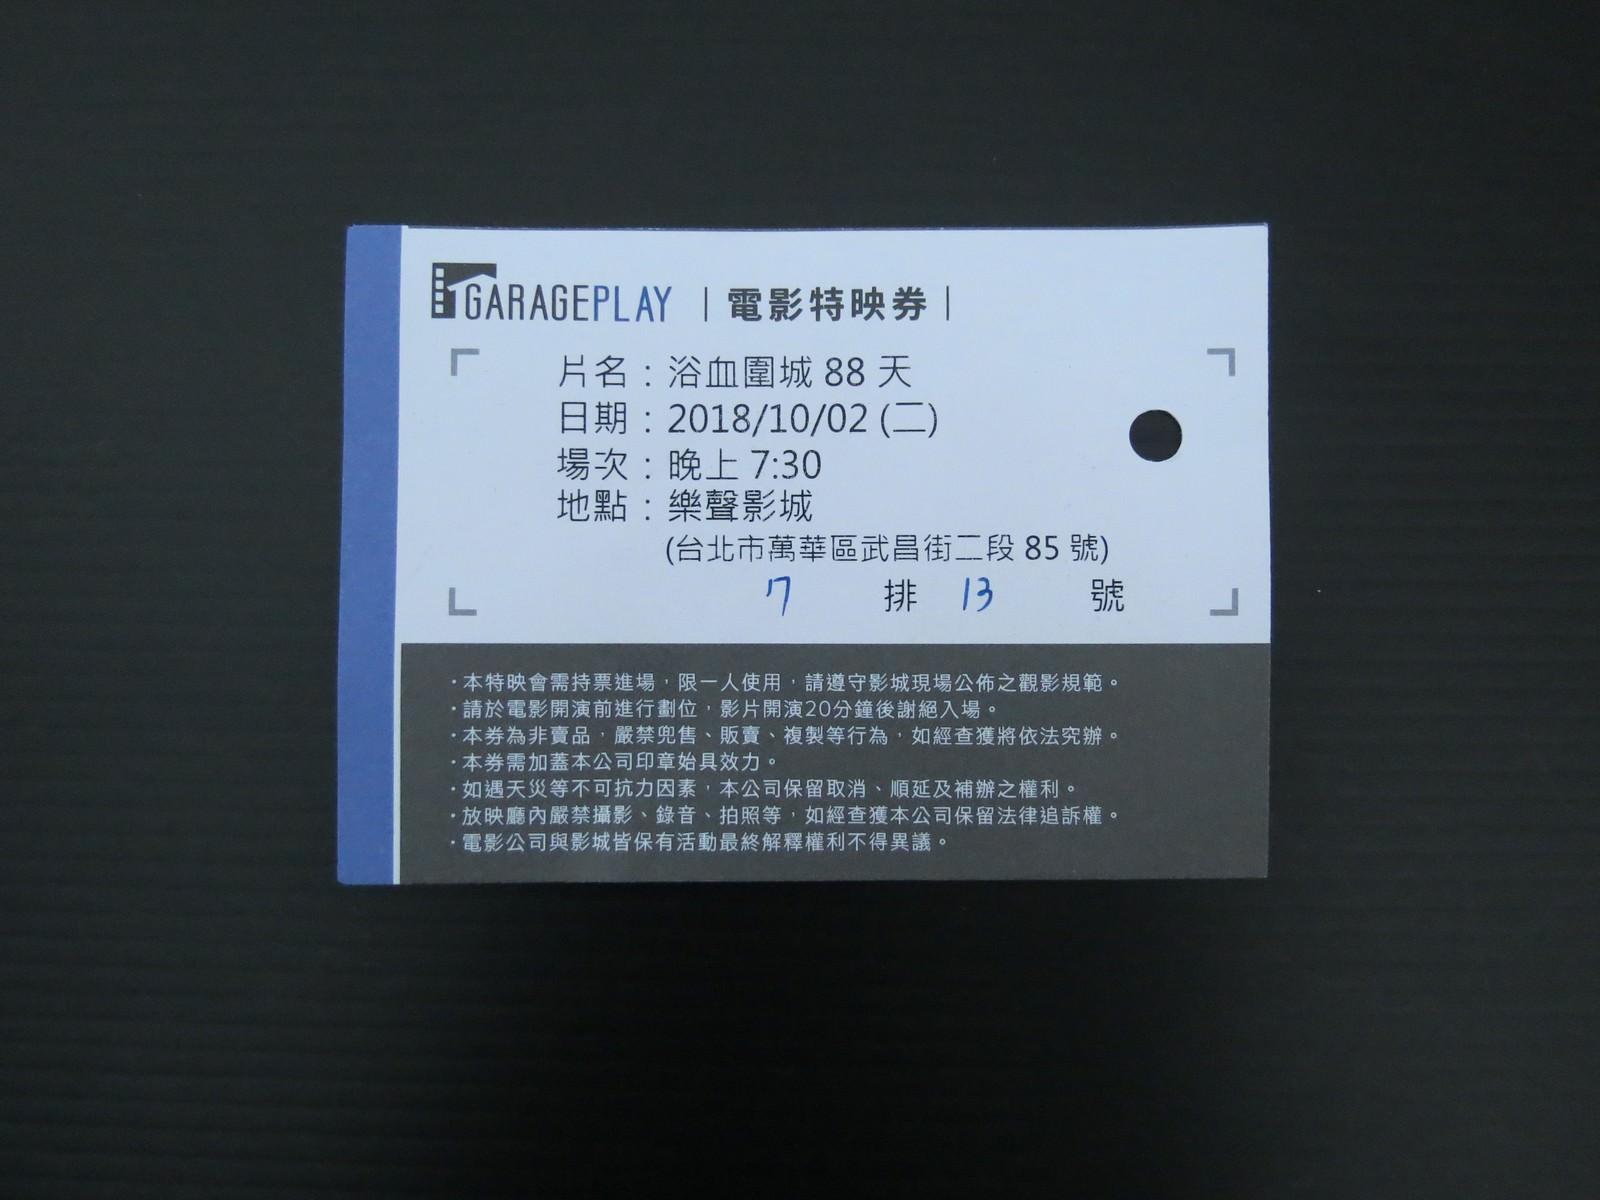 Movie, 안시성(韓國, 2018) / 浴血圍城88天(台灣) / 安市城(香港) / The Great Battle(英文), 電影票(特映會)